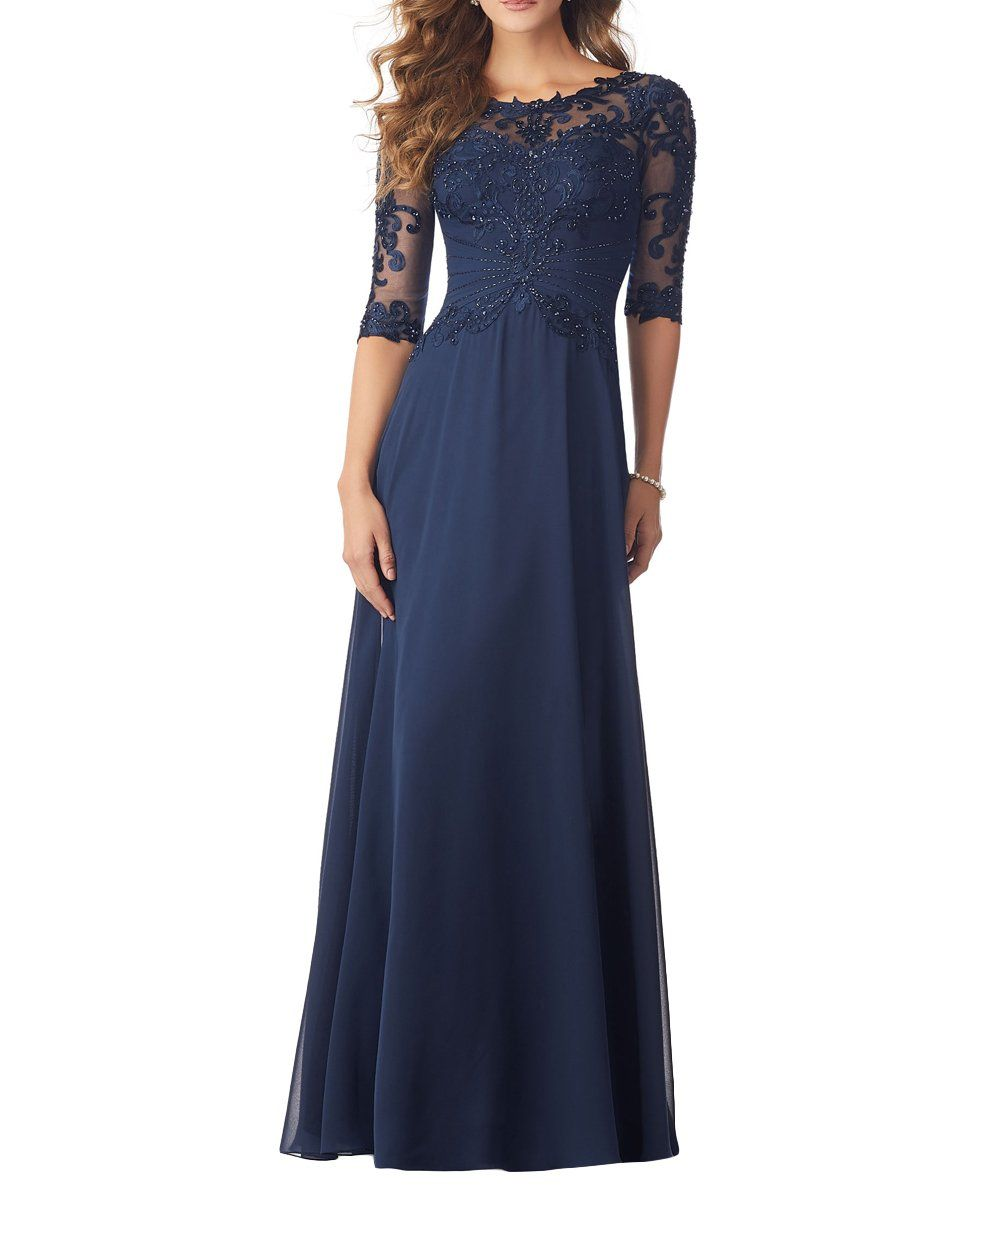 Charmant Damen 16 Neu Elegant Langarm Spitze Abendkleider